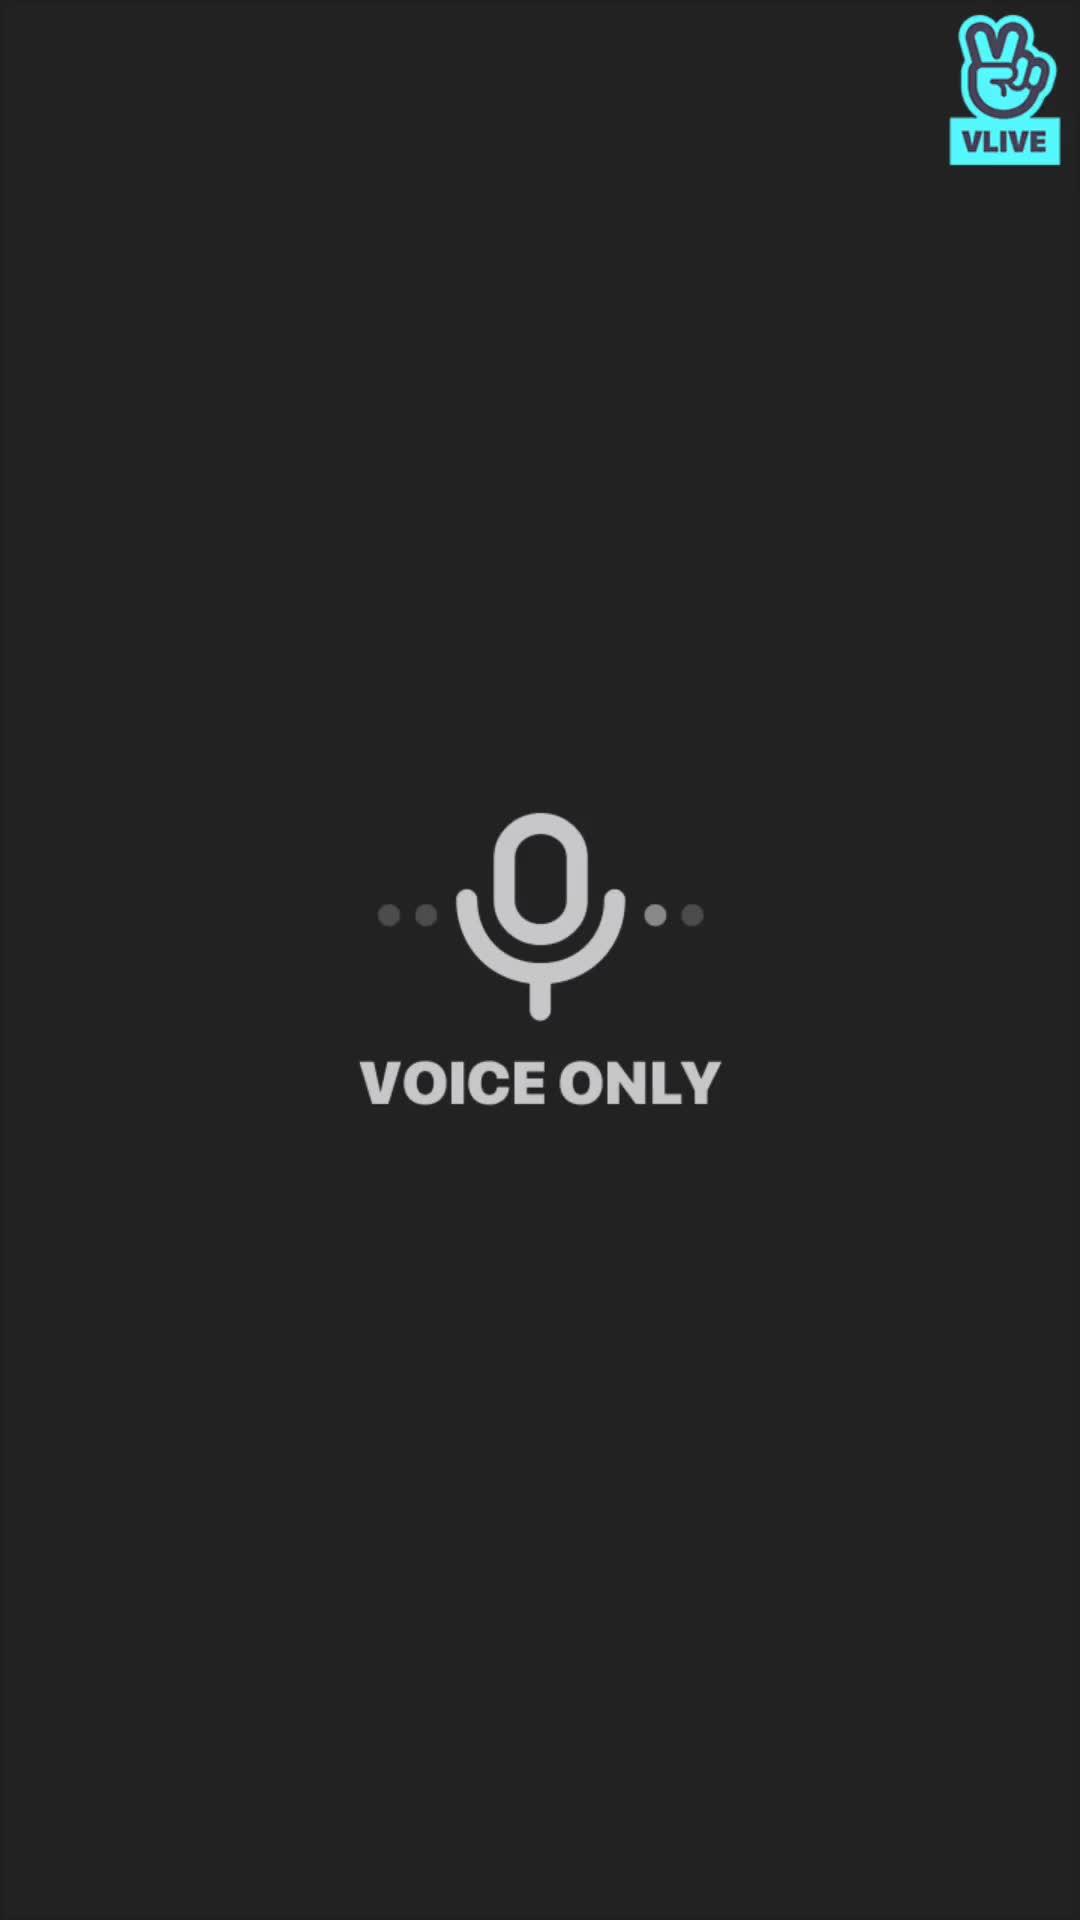 [RADIO] 캐럿들 귀대귀대 #73 정한이의 따뜻한 우유 한 잔